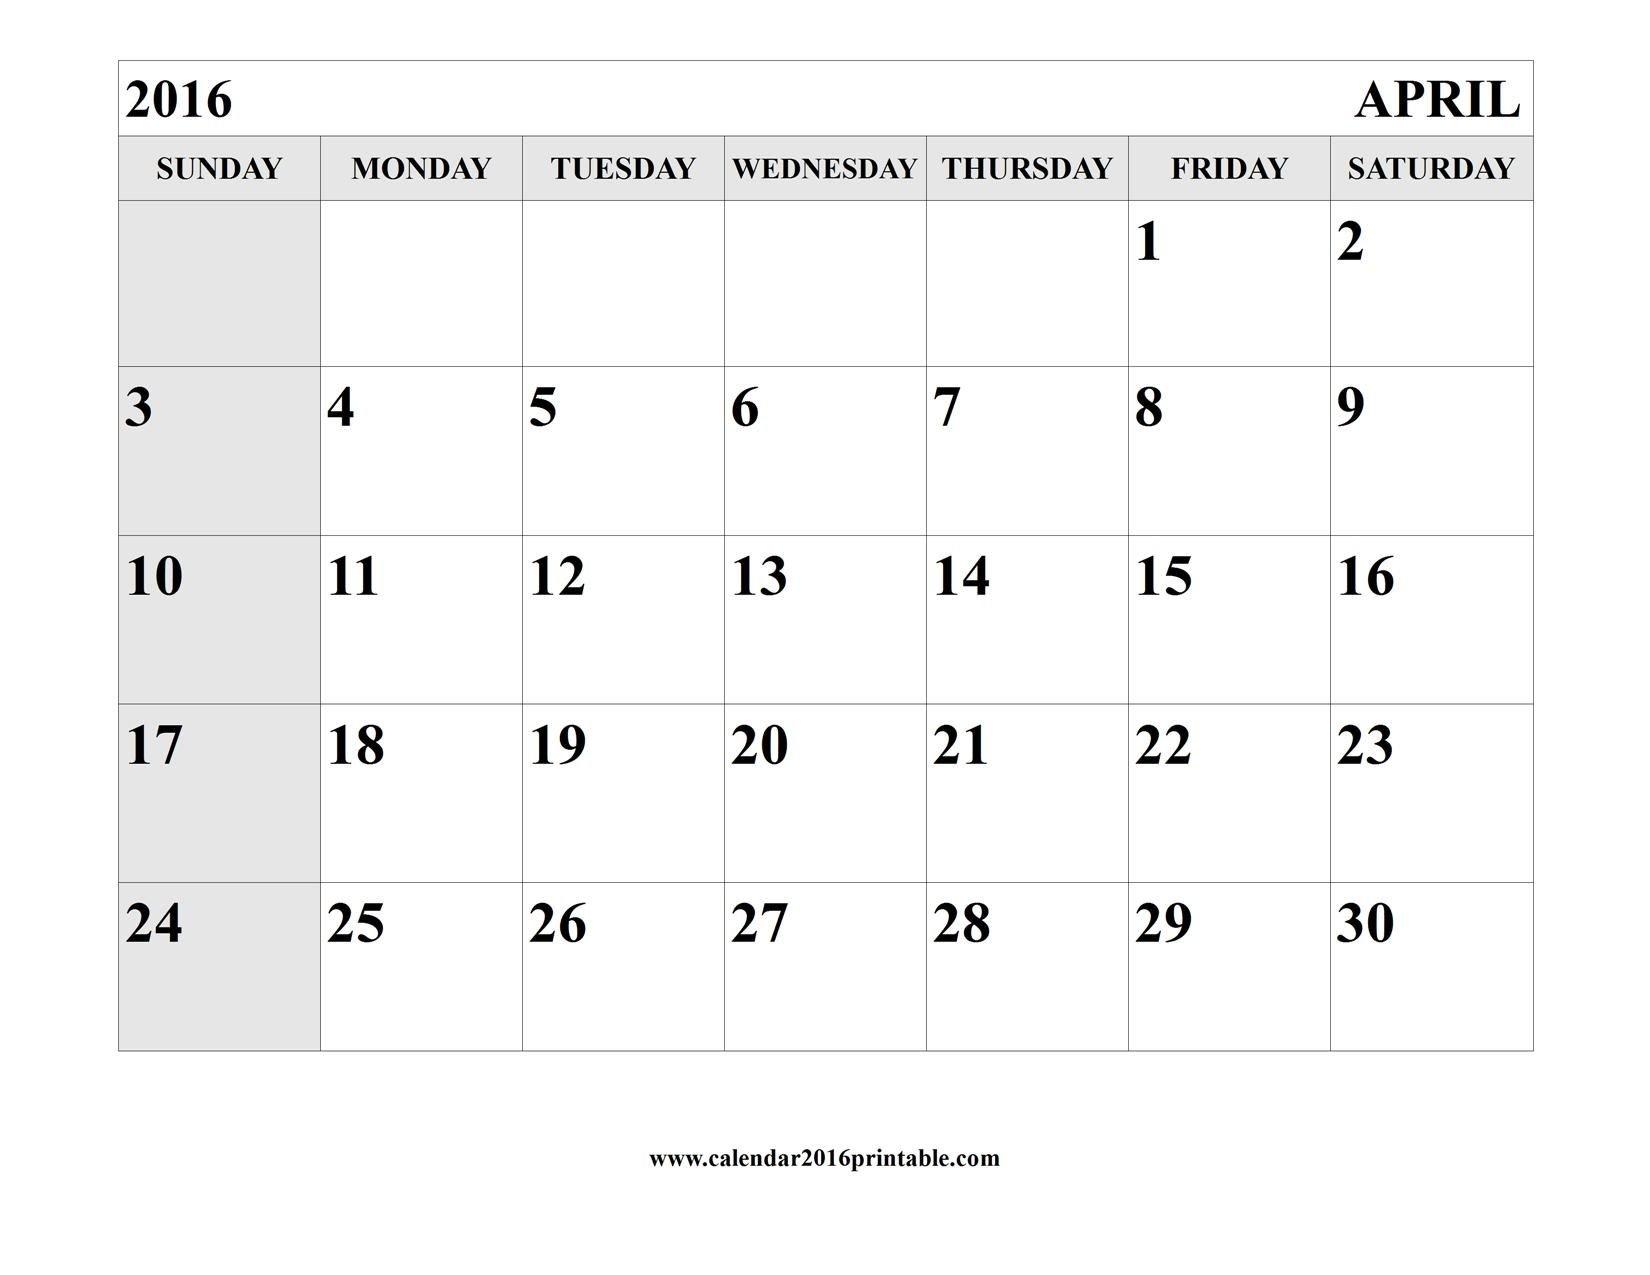 April 2016 Calendar Printable Template | Calendar Template Printable Calenders You Can Edit